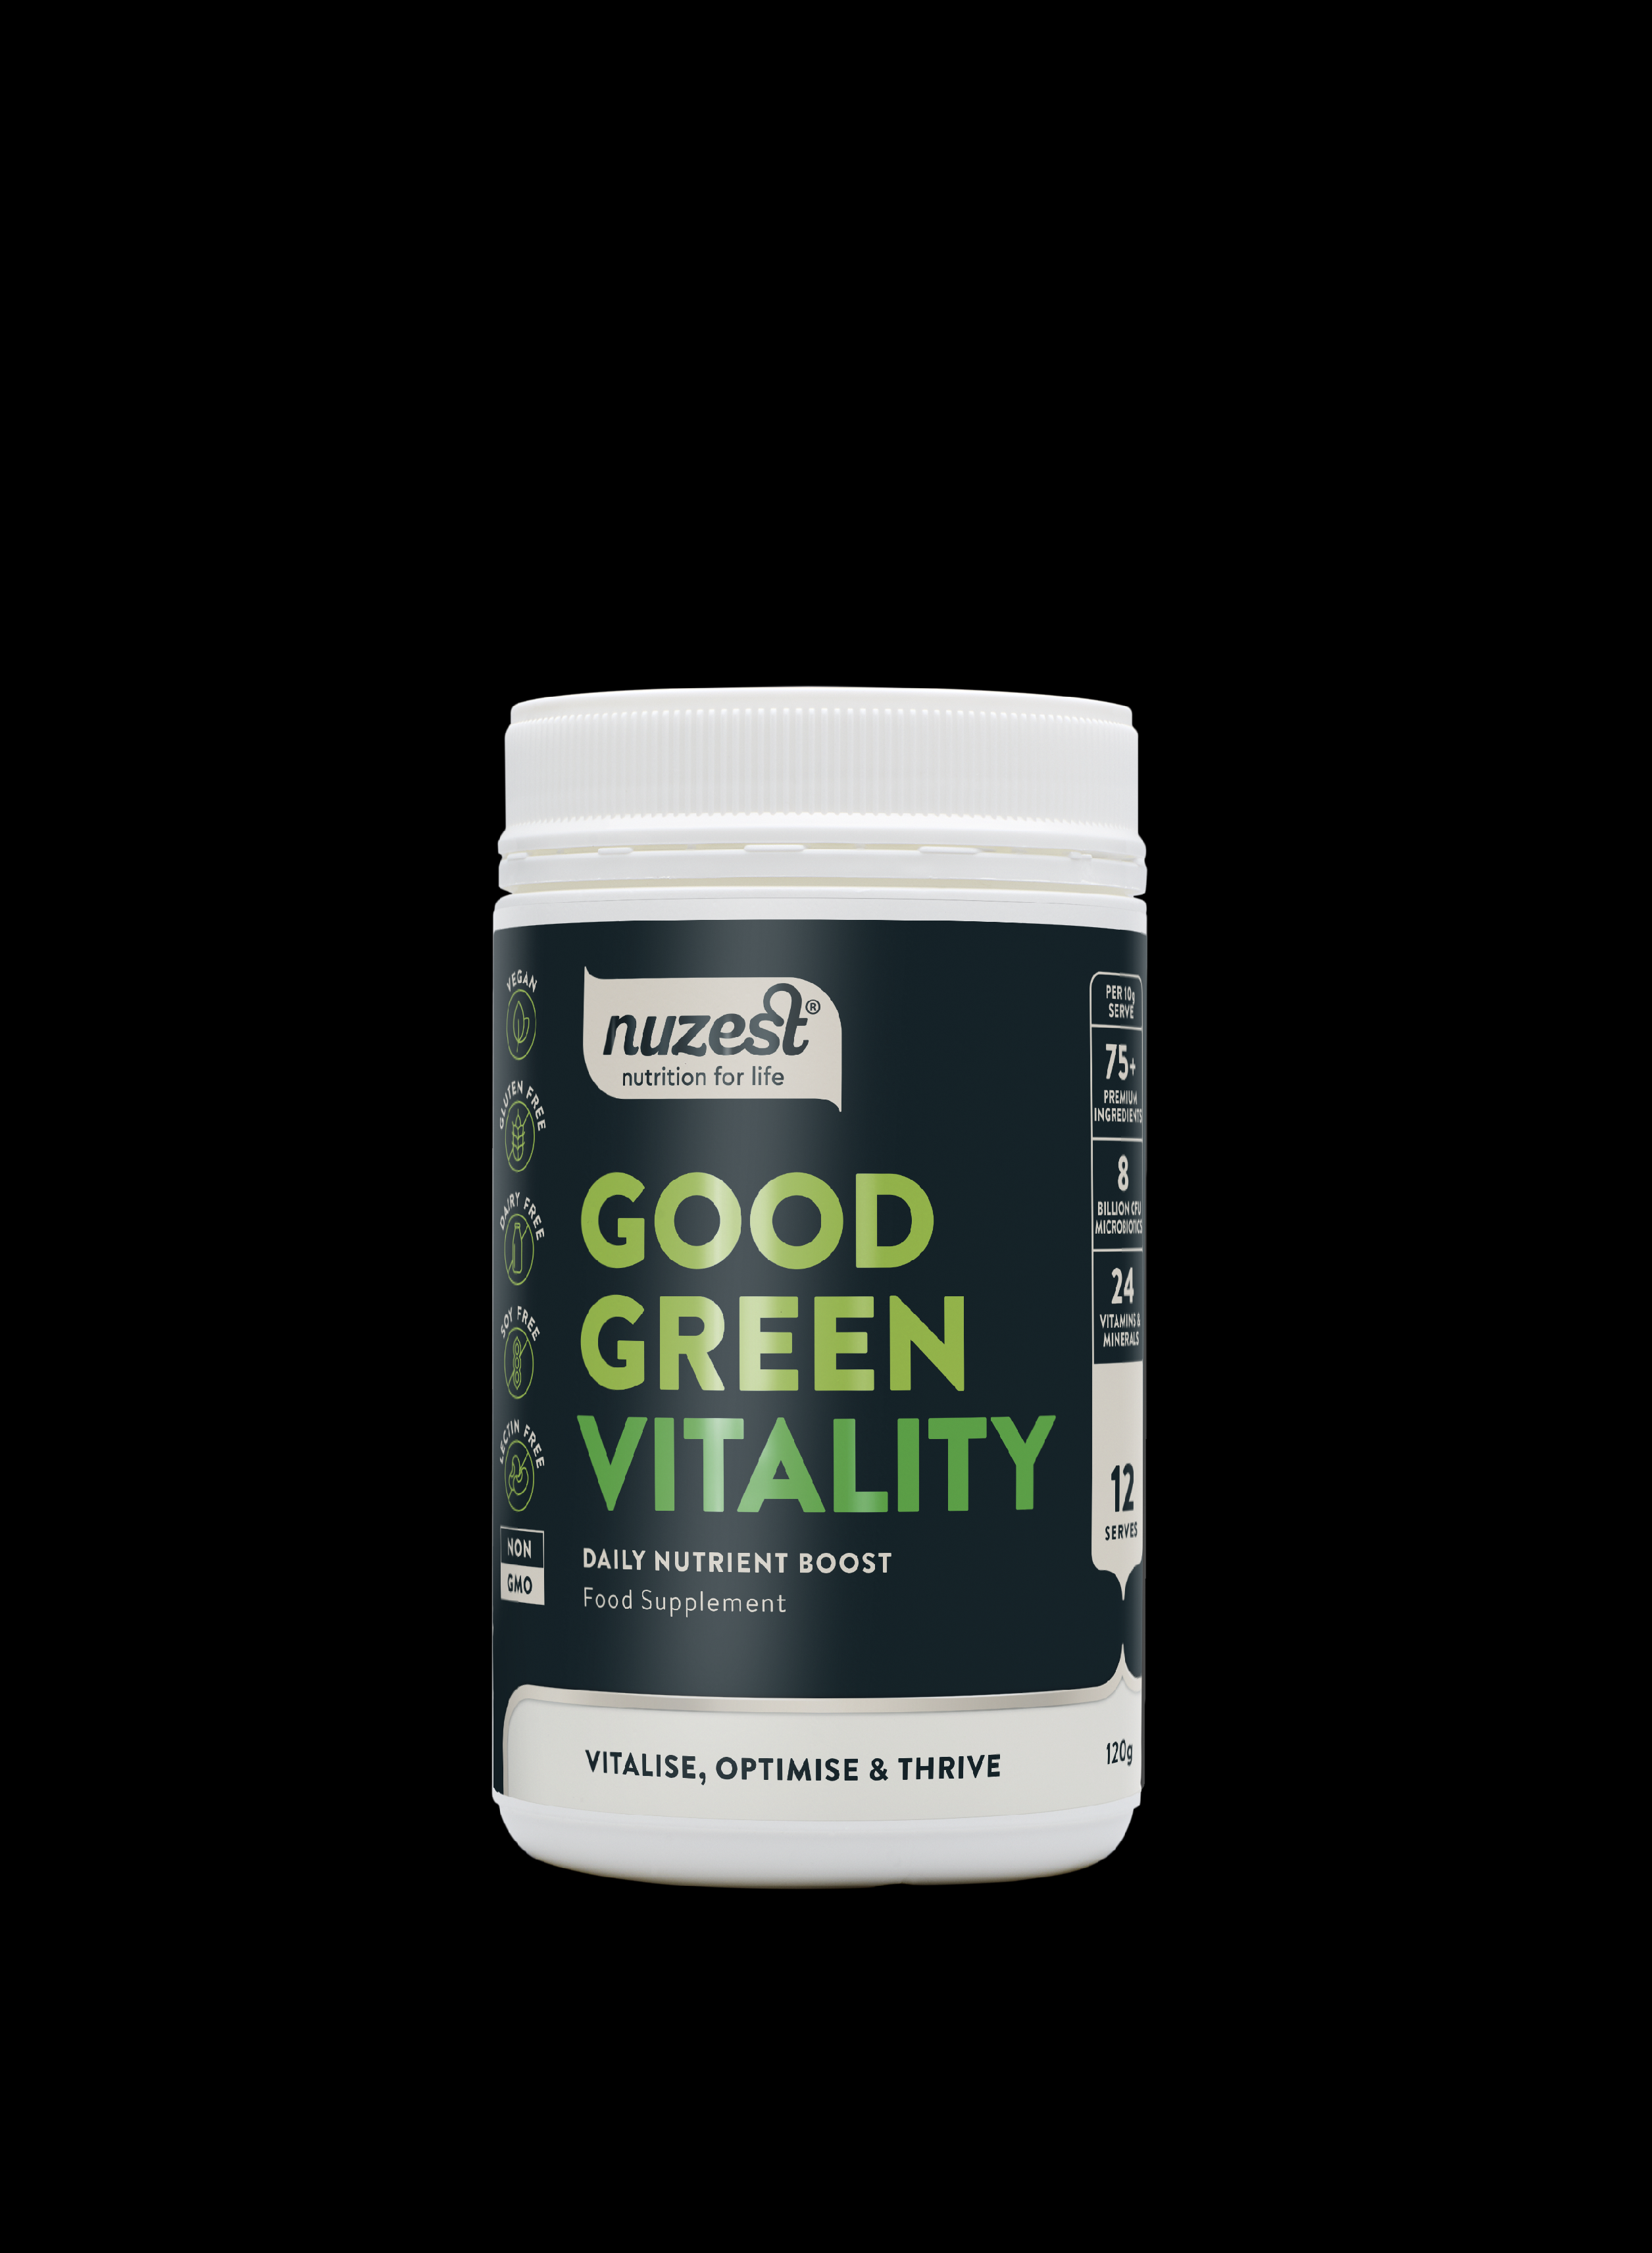 Nuzest - Good Green Vitality, 120g